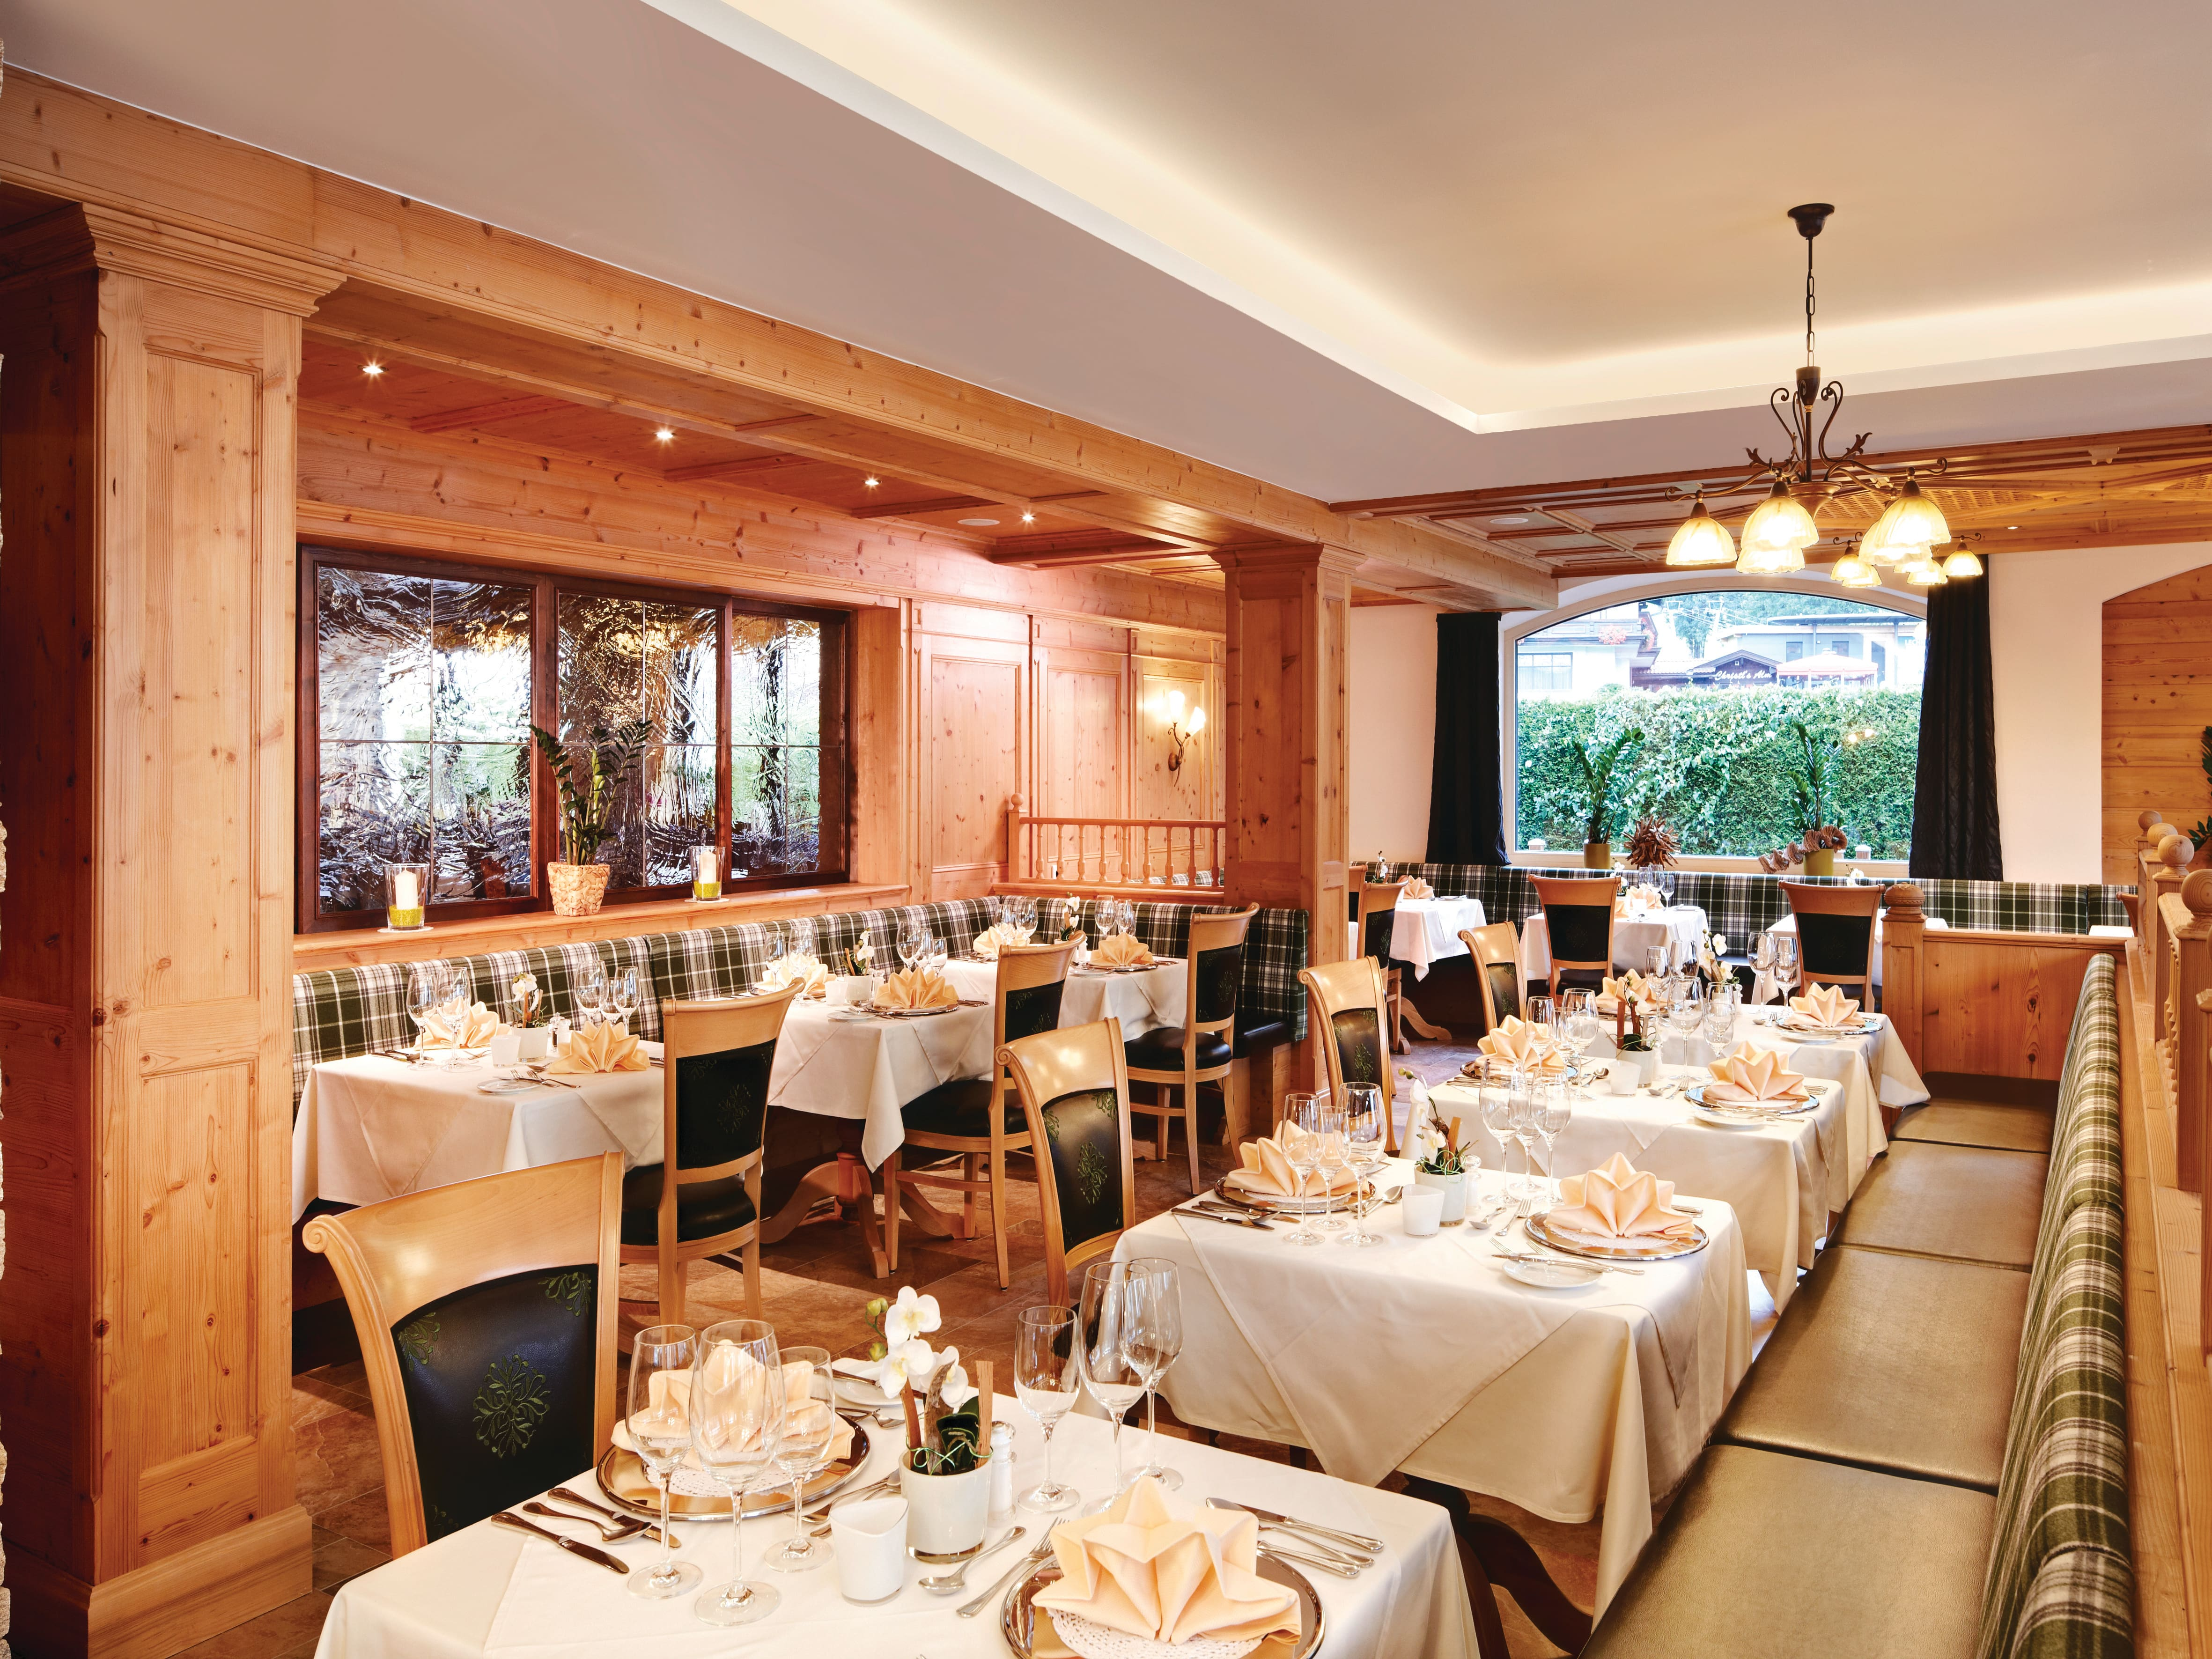 Hotel Tauernhof restaurant in Kaprun